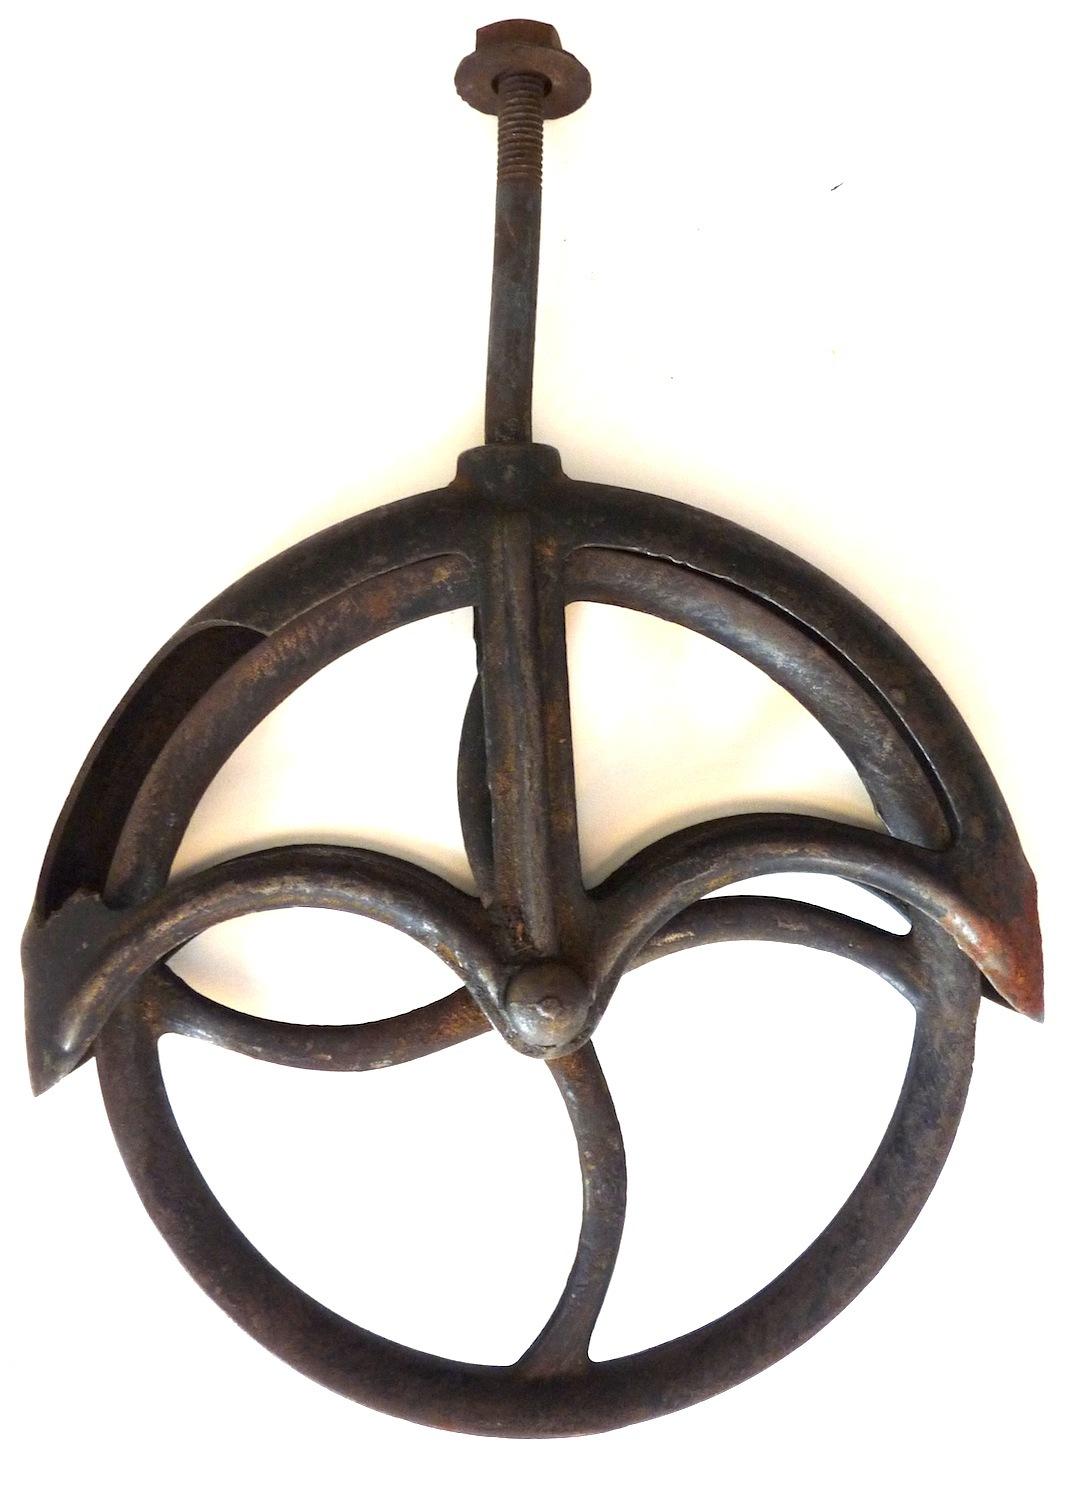 Pulleys Antique Looking : Antique vintage cast iron pulley wheel farm industrial